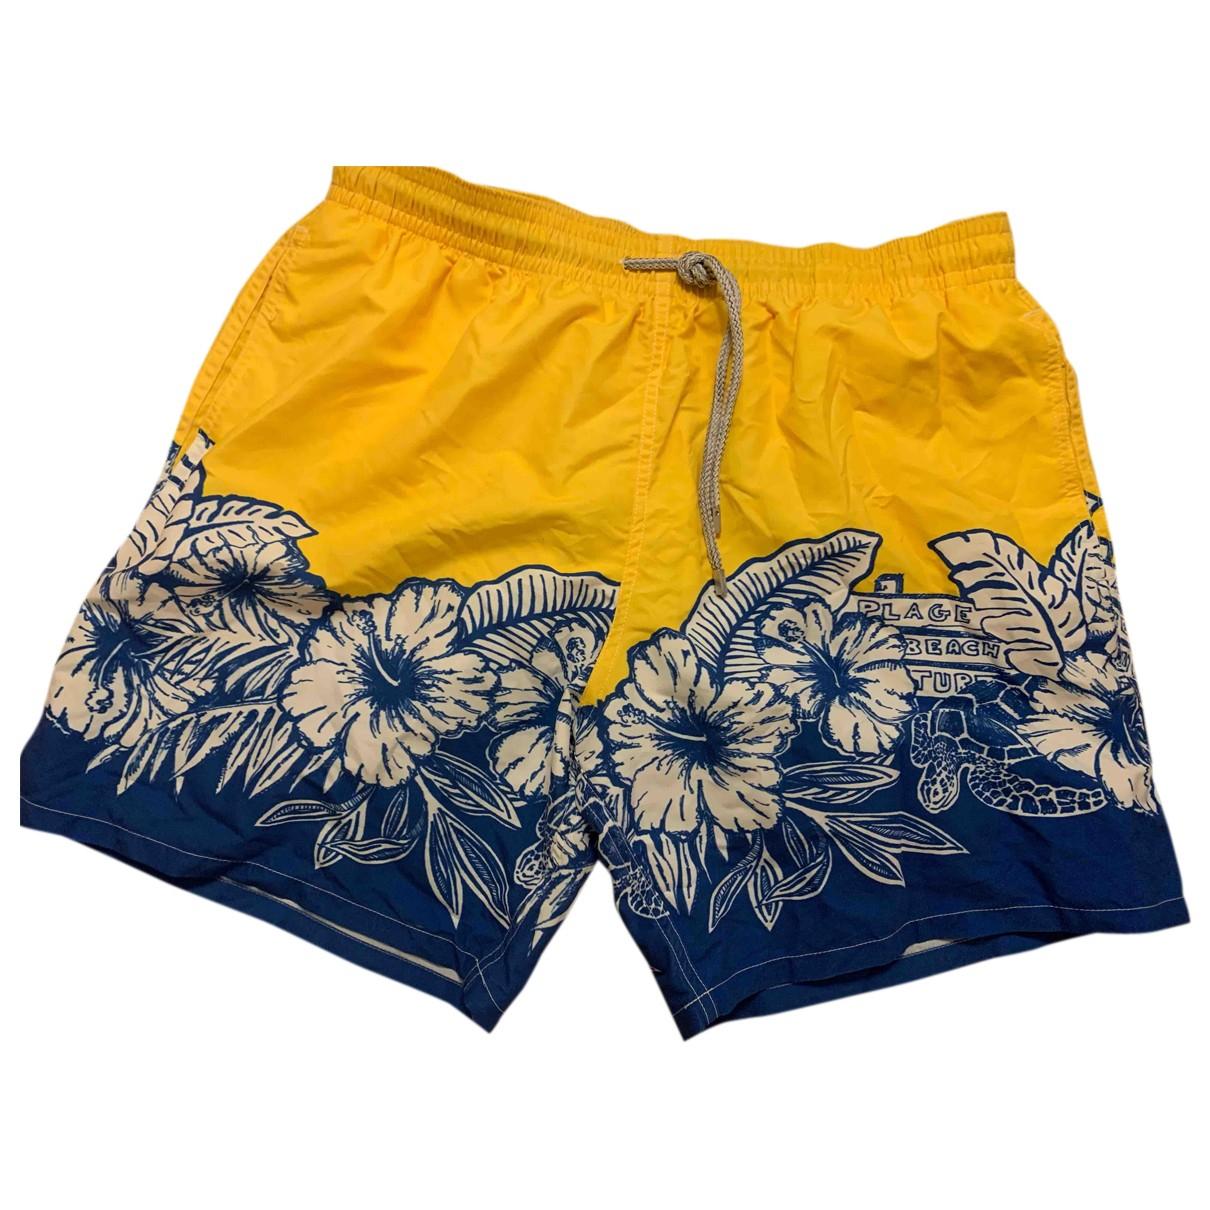 Vilebrequin \N Badeanzug in  Gelb Polyester